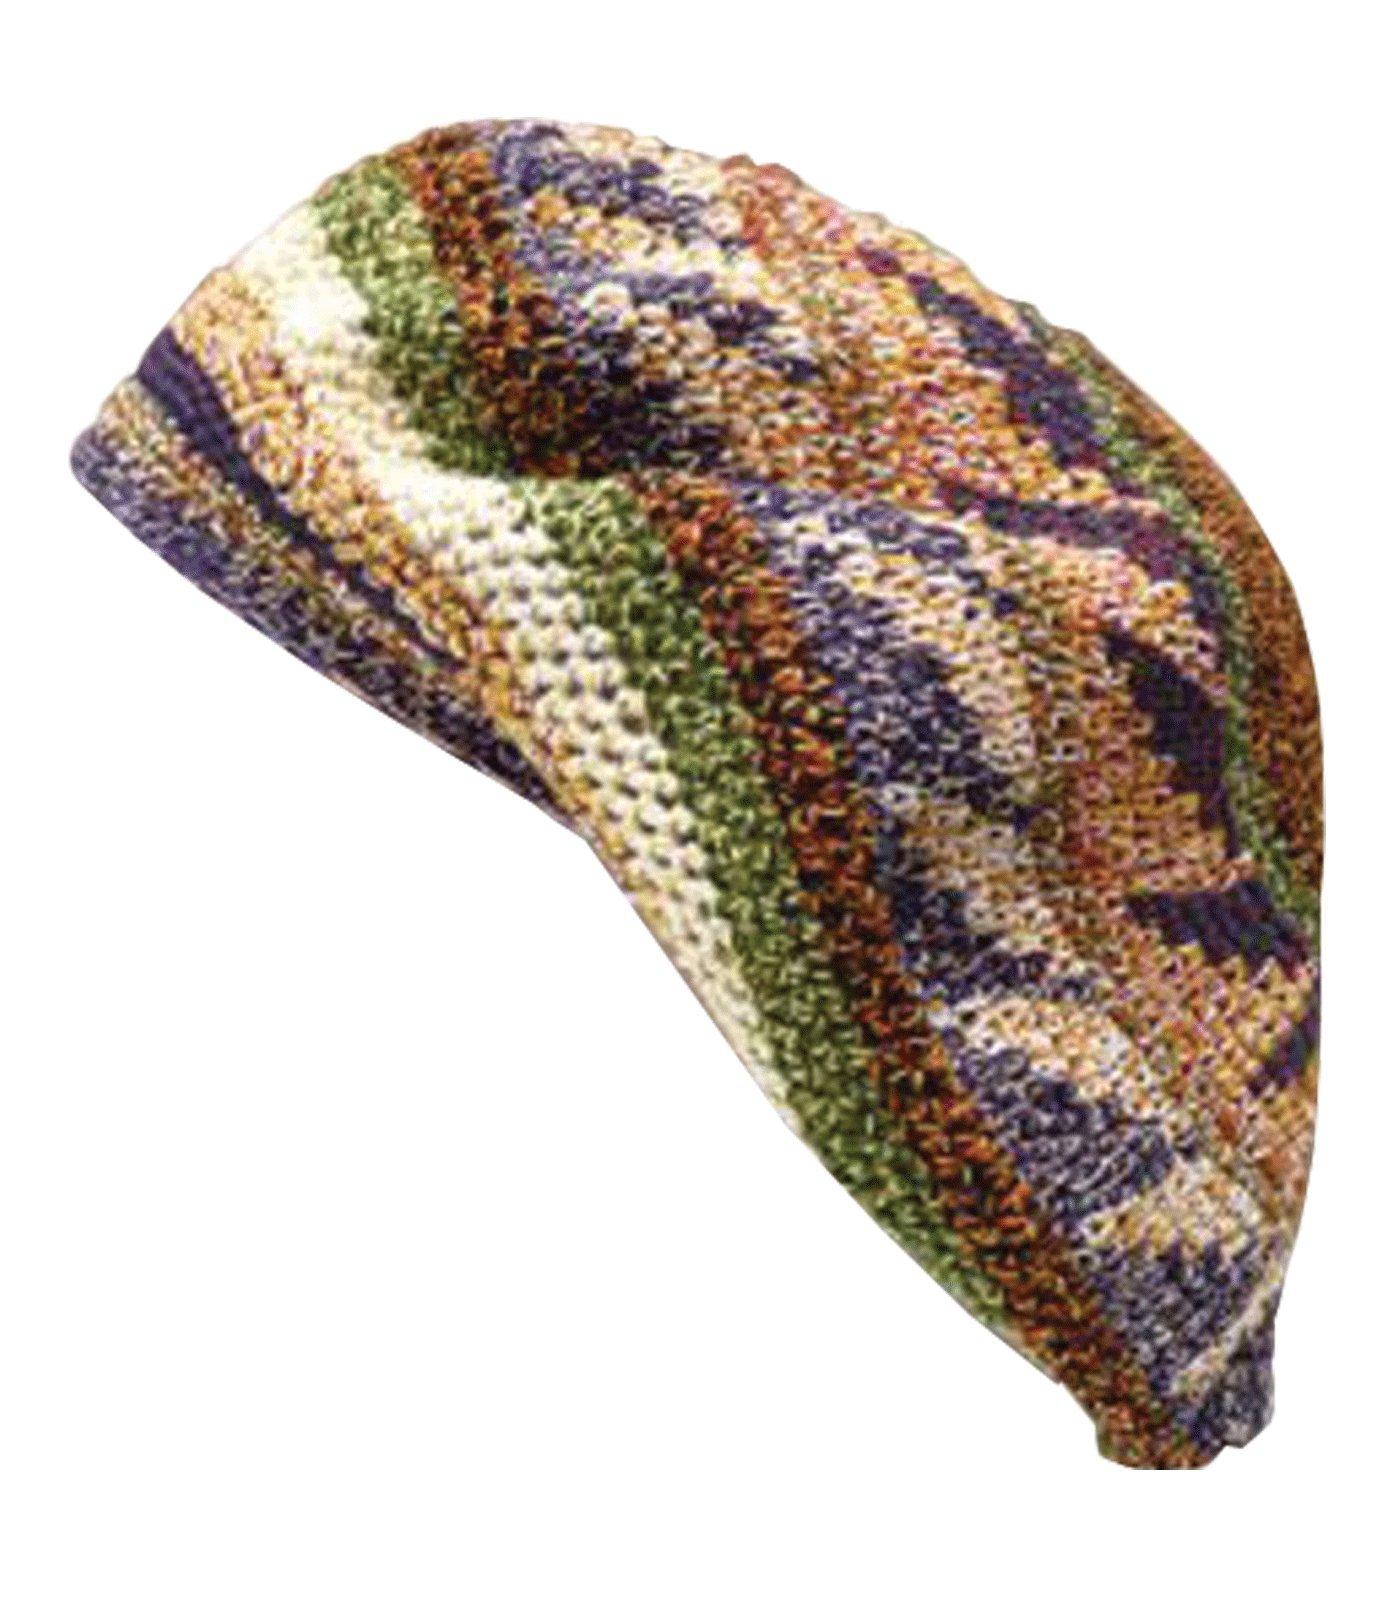 Inspirit Arts Tam Berets Hat Heathered Earth tone Crochet Knit Slouchy Dreadlock Cap